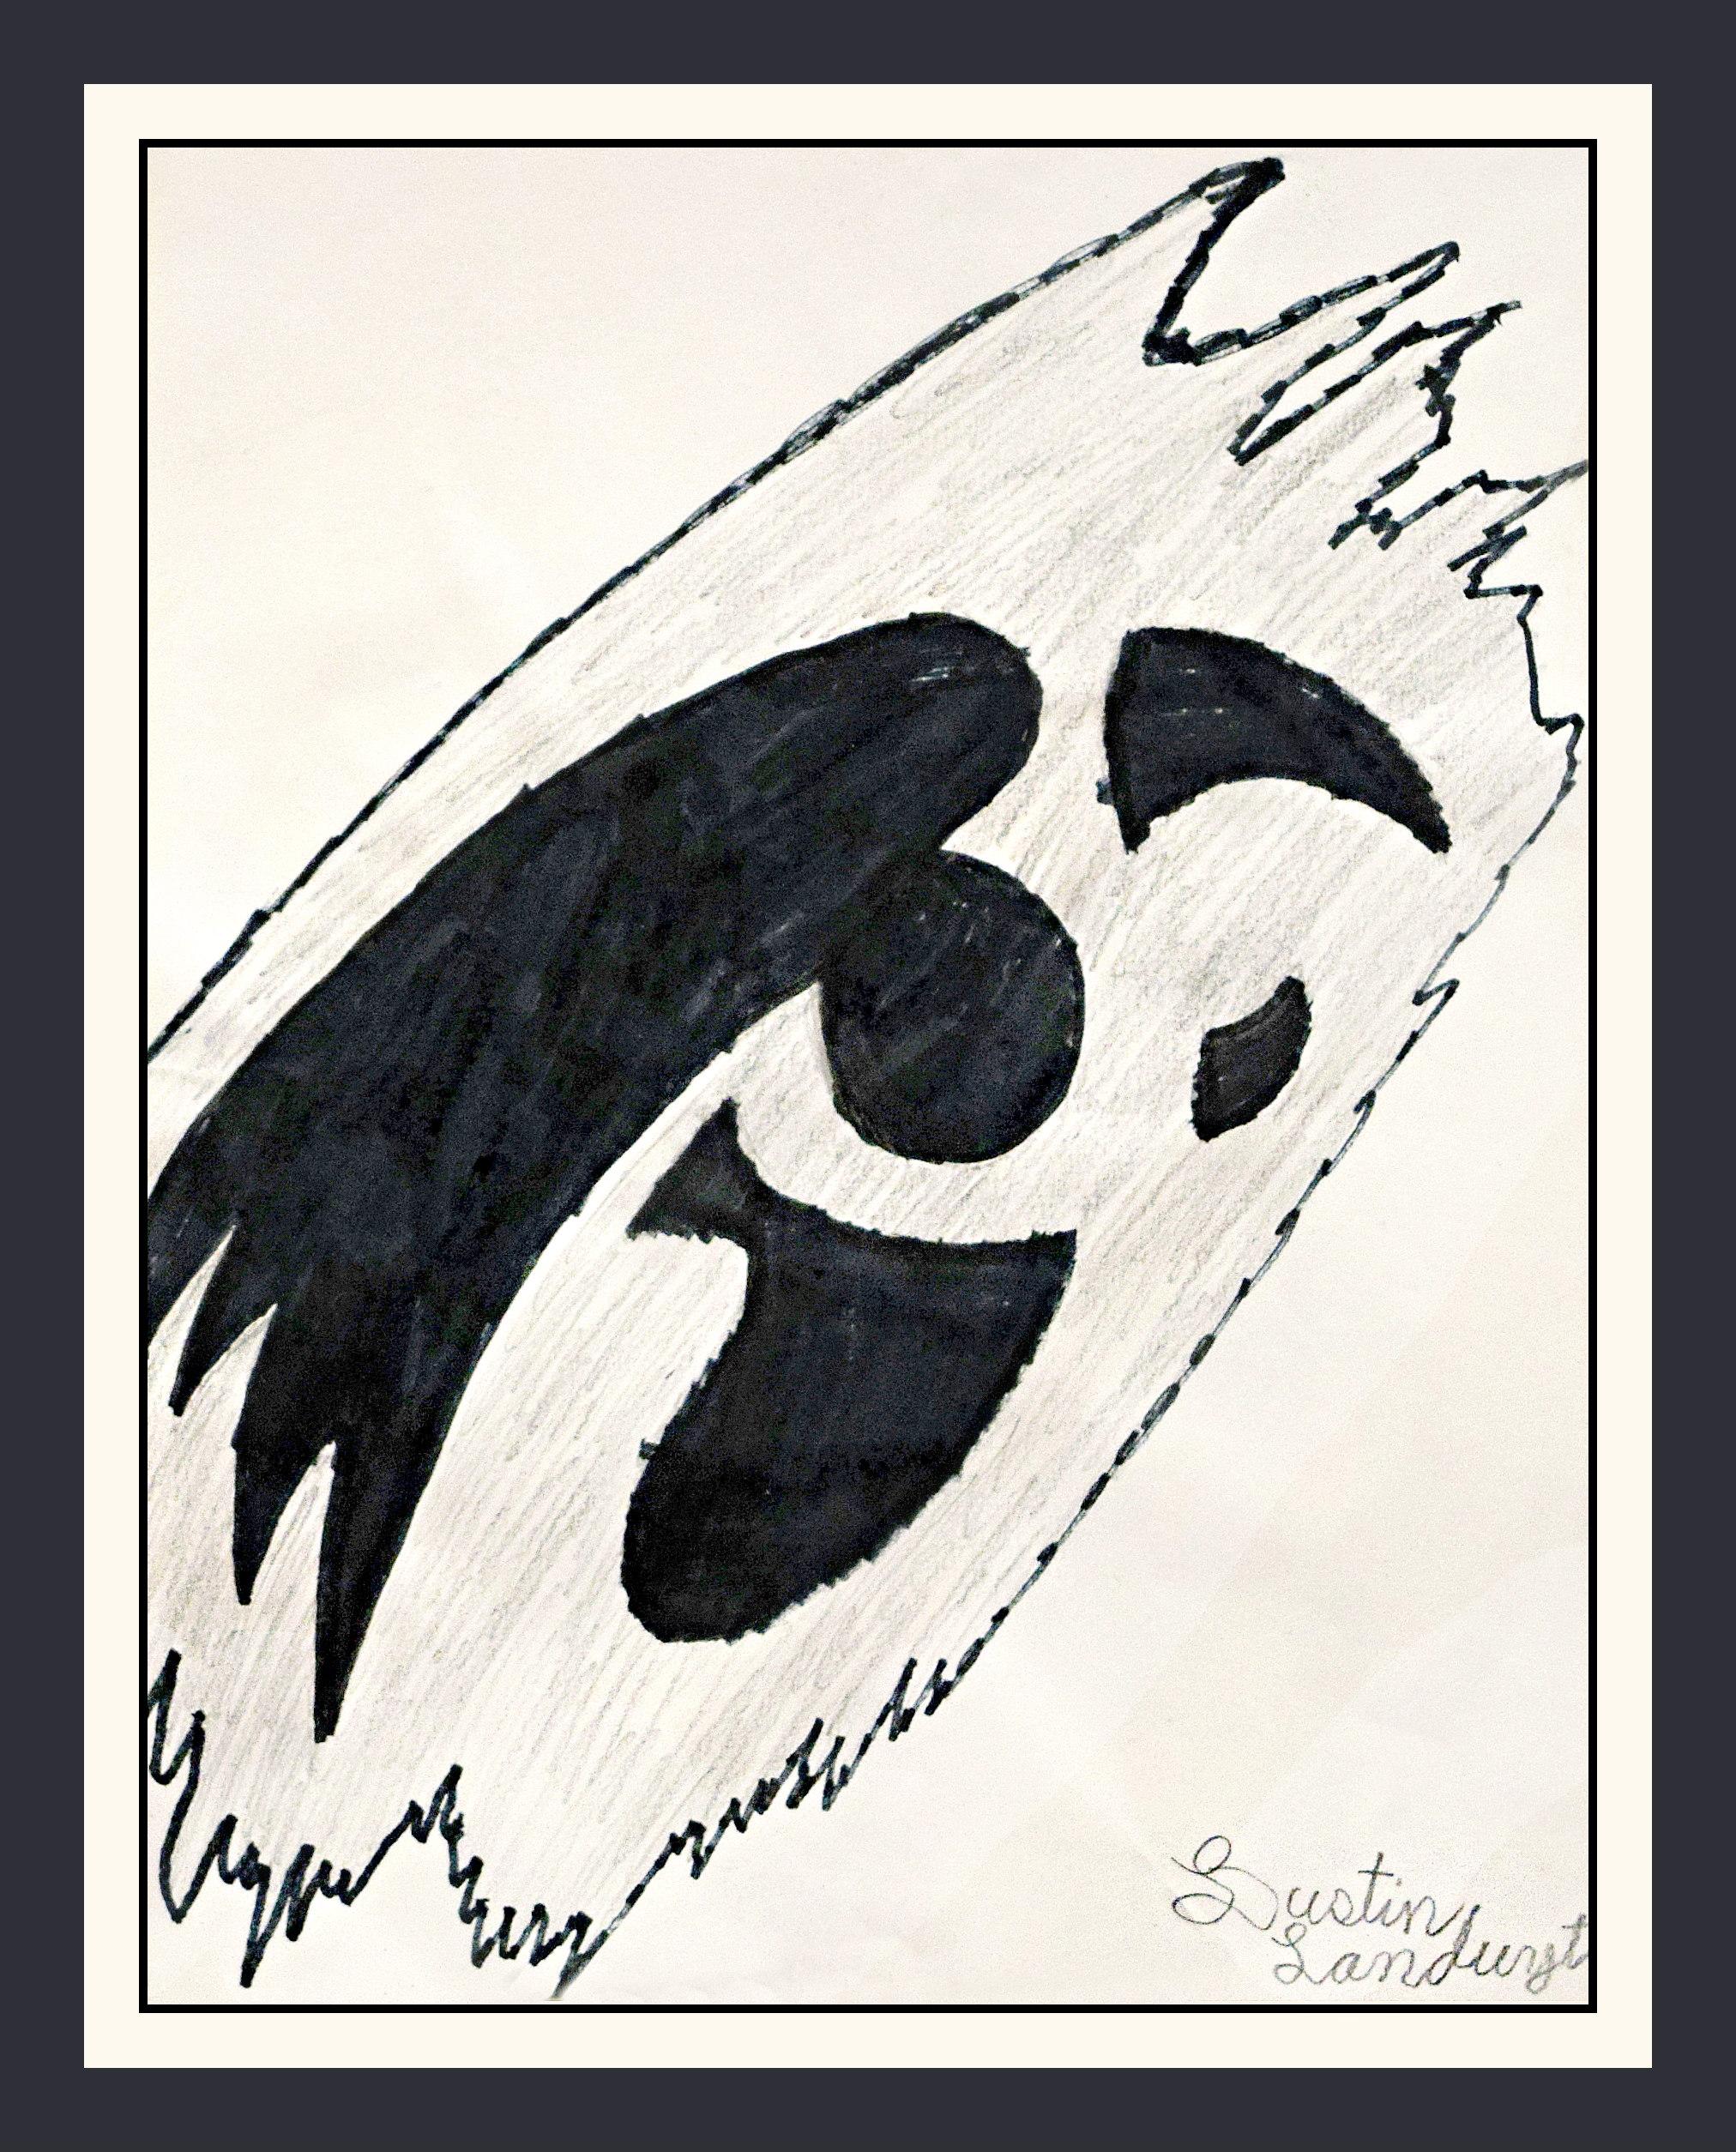 Dustin Landyut   Iowa Hawkeye 2016   Marker on paper, 8x11 $20 or print $15